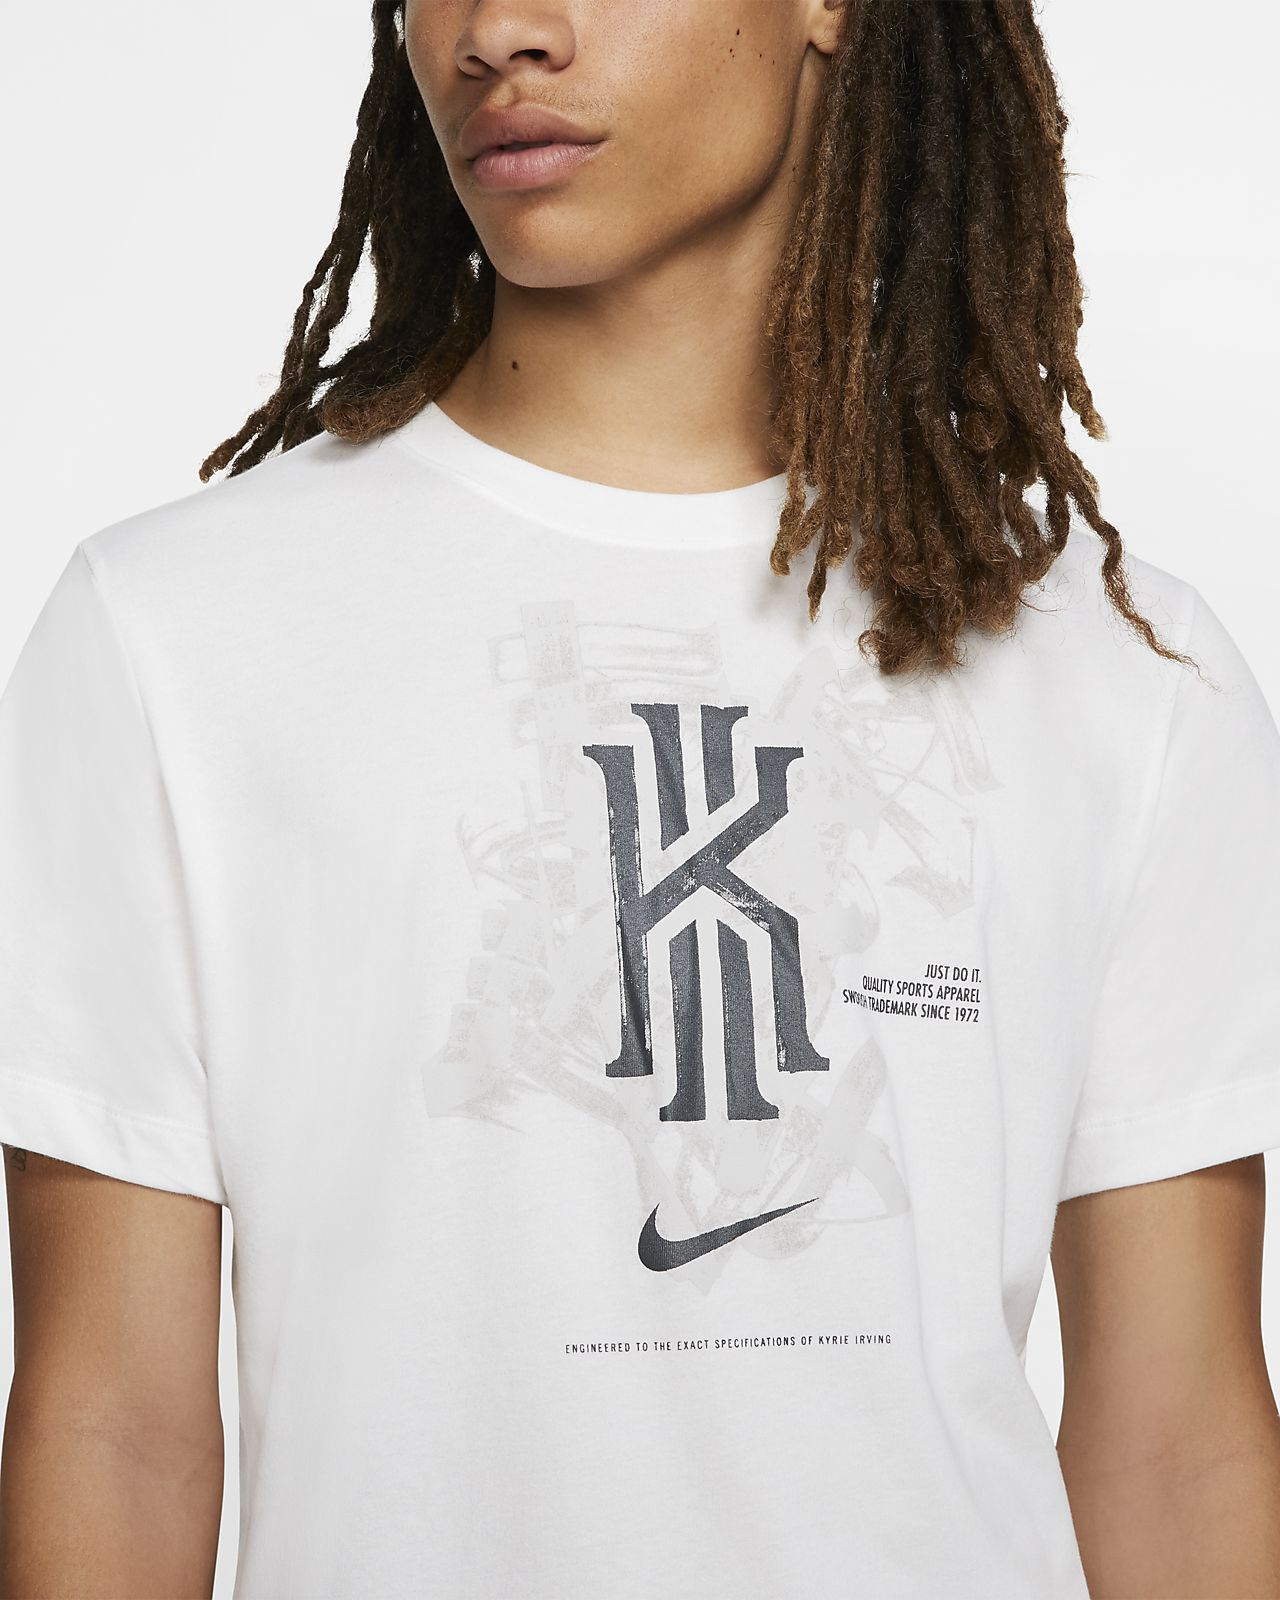 175669b5 Nike Dri-FIT Kyrie Men's Basketball T-Shirt. Nike.com AU